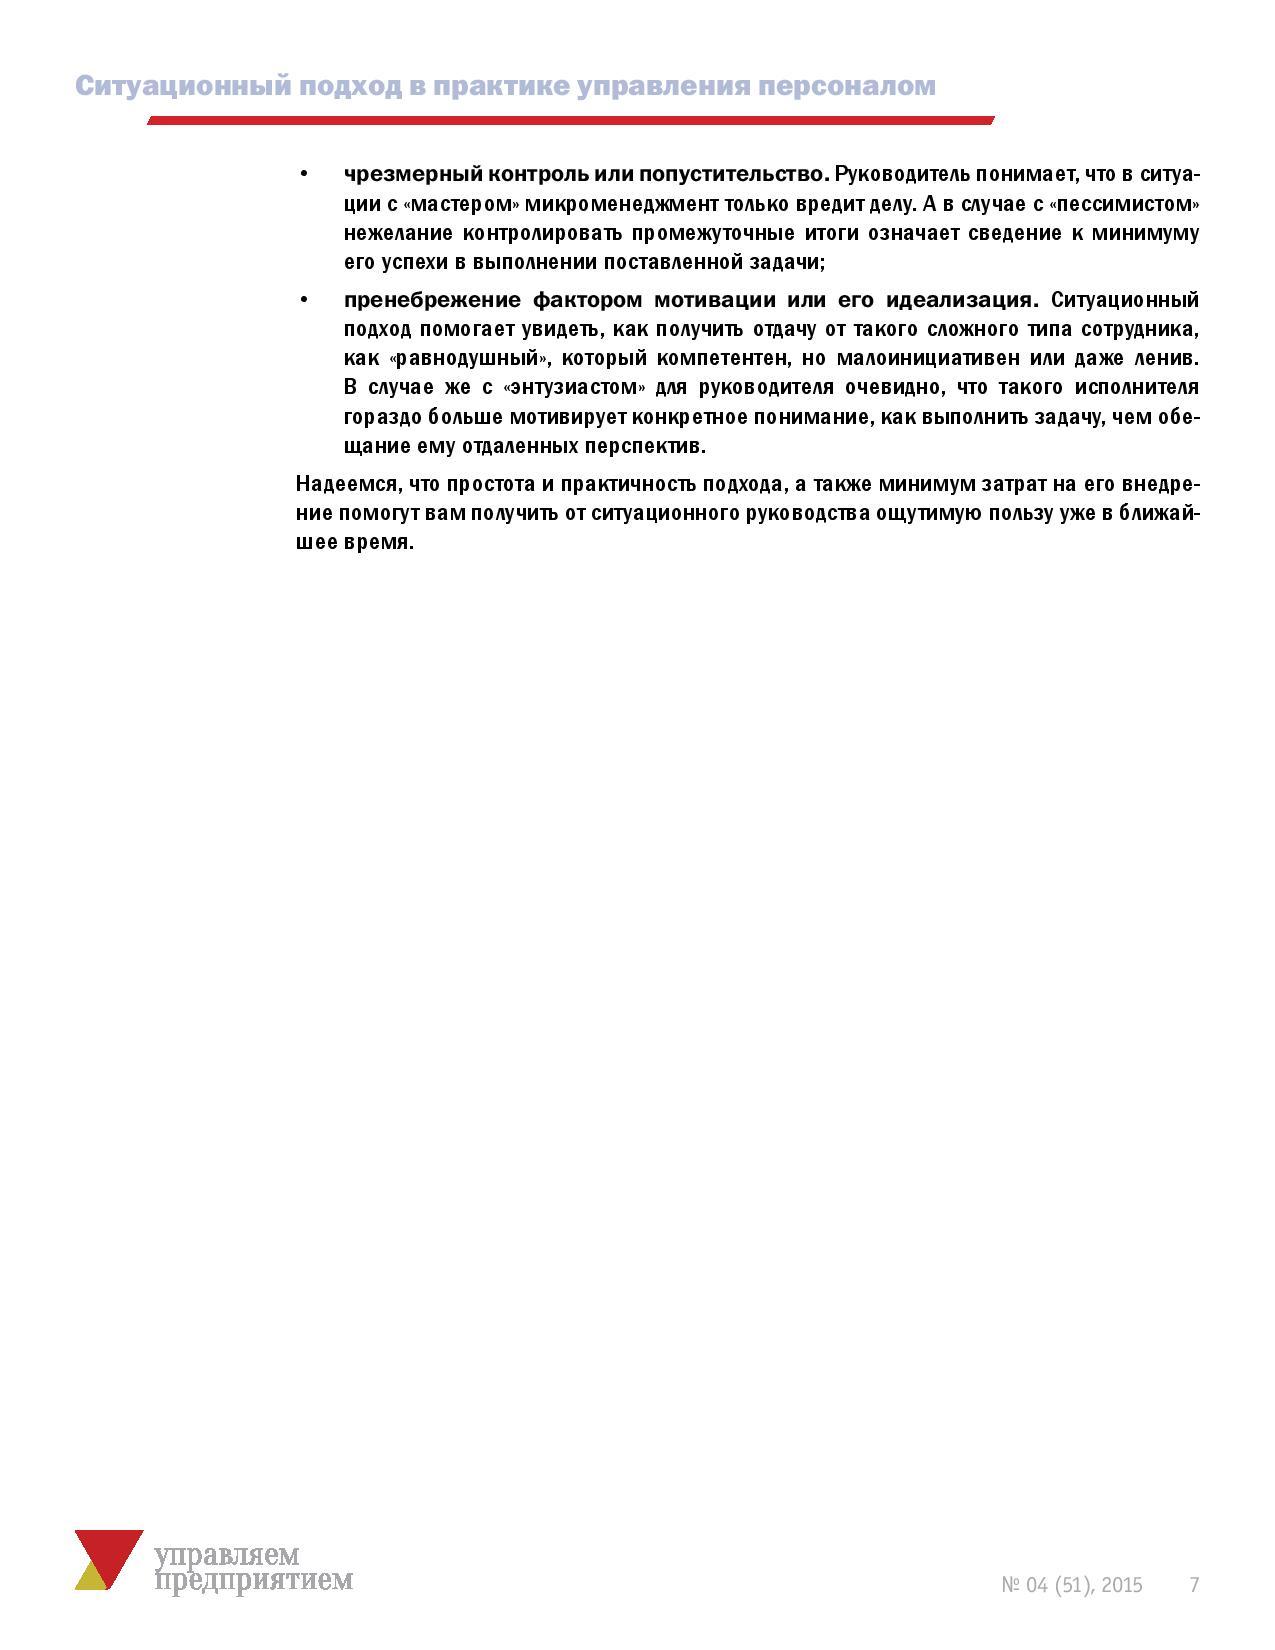 Situacionnyy_podhod_Cast__2._Upravlaem_predpriatiem__04_2015-page-007